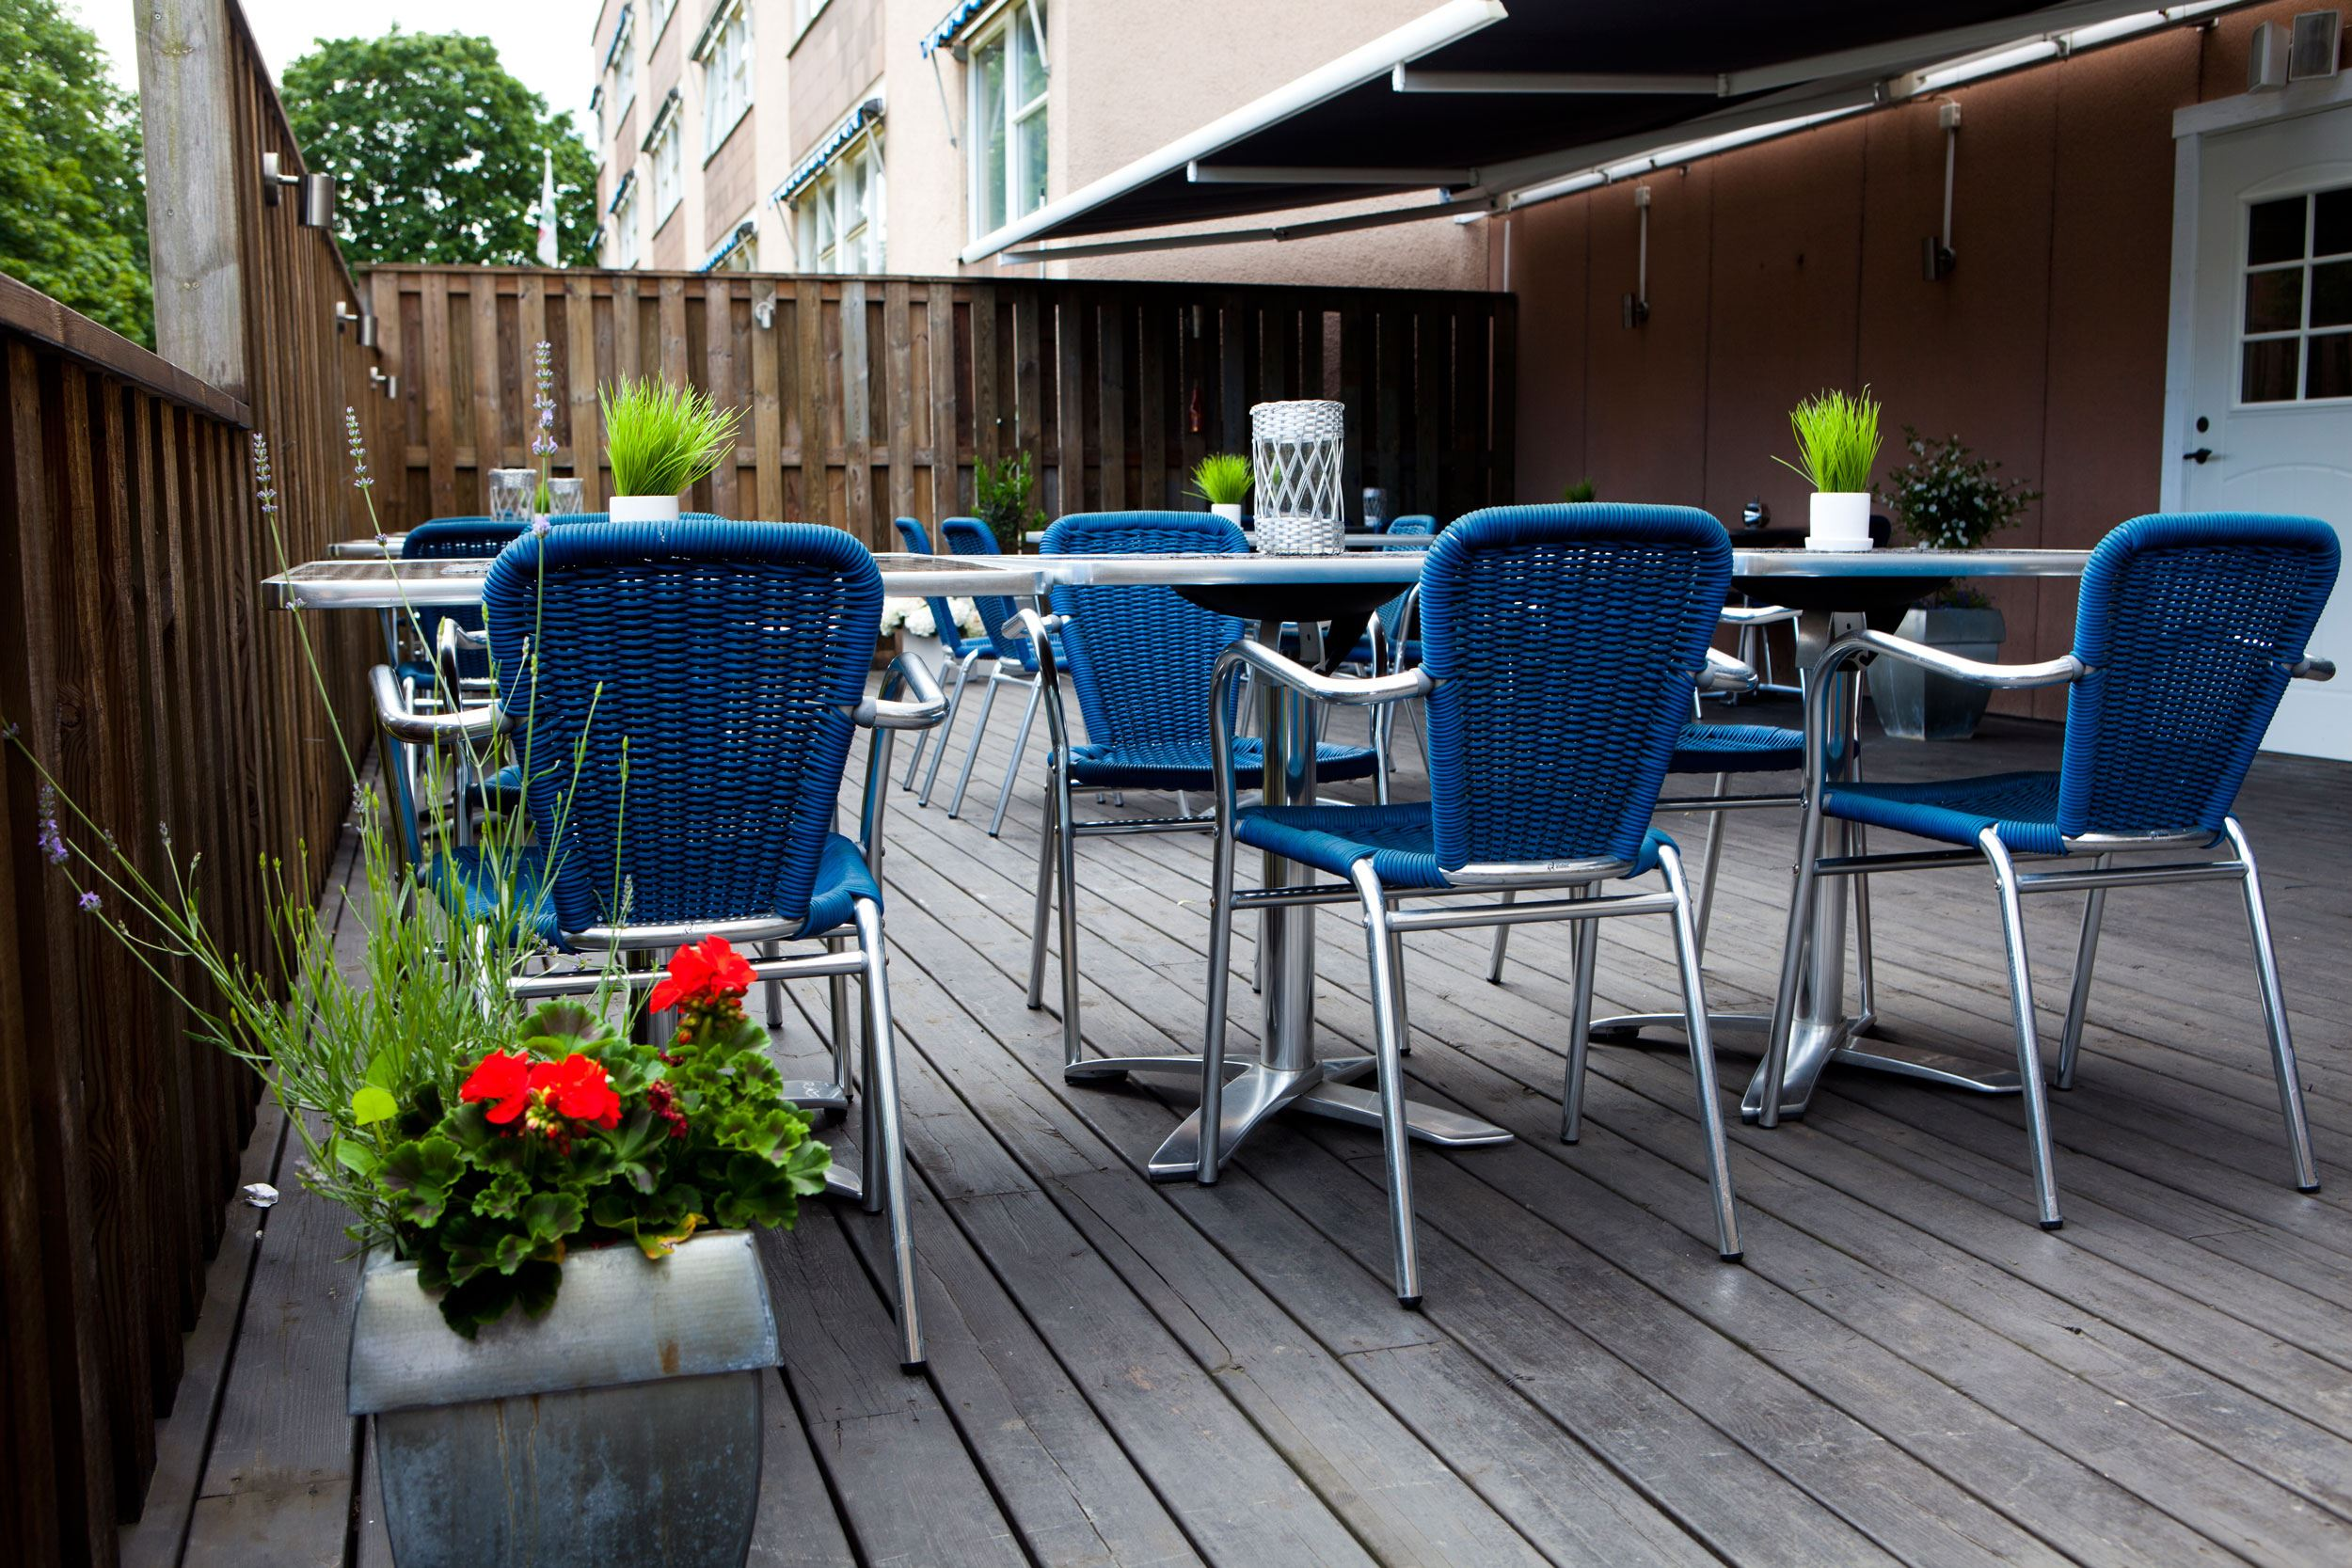 Hotel Prisma, Skövde